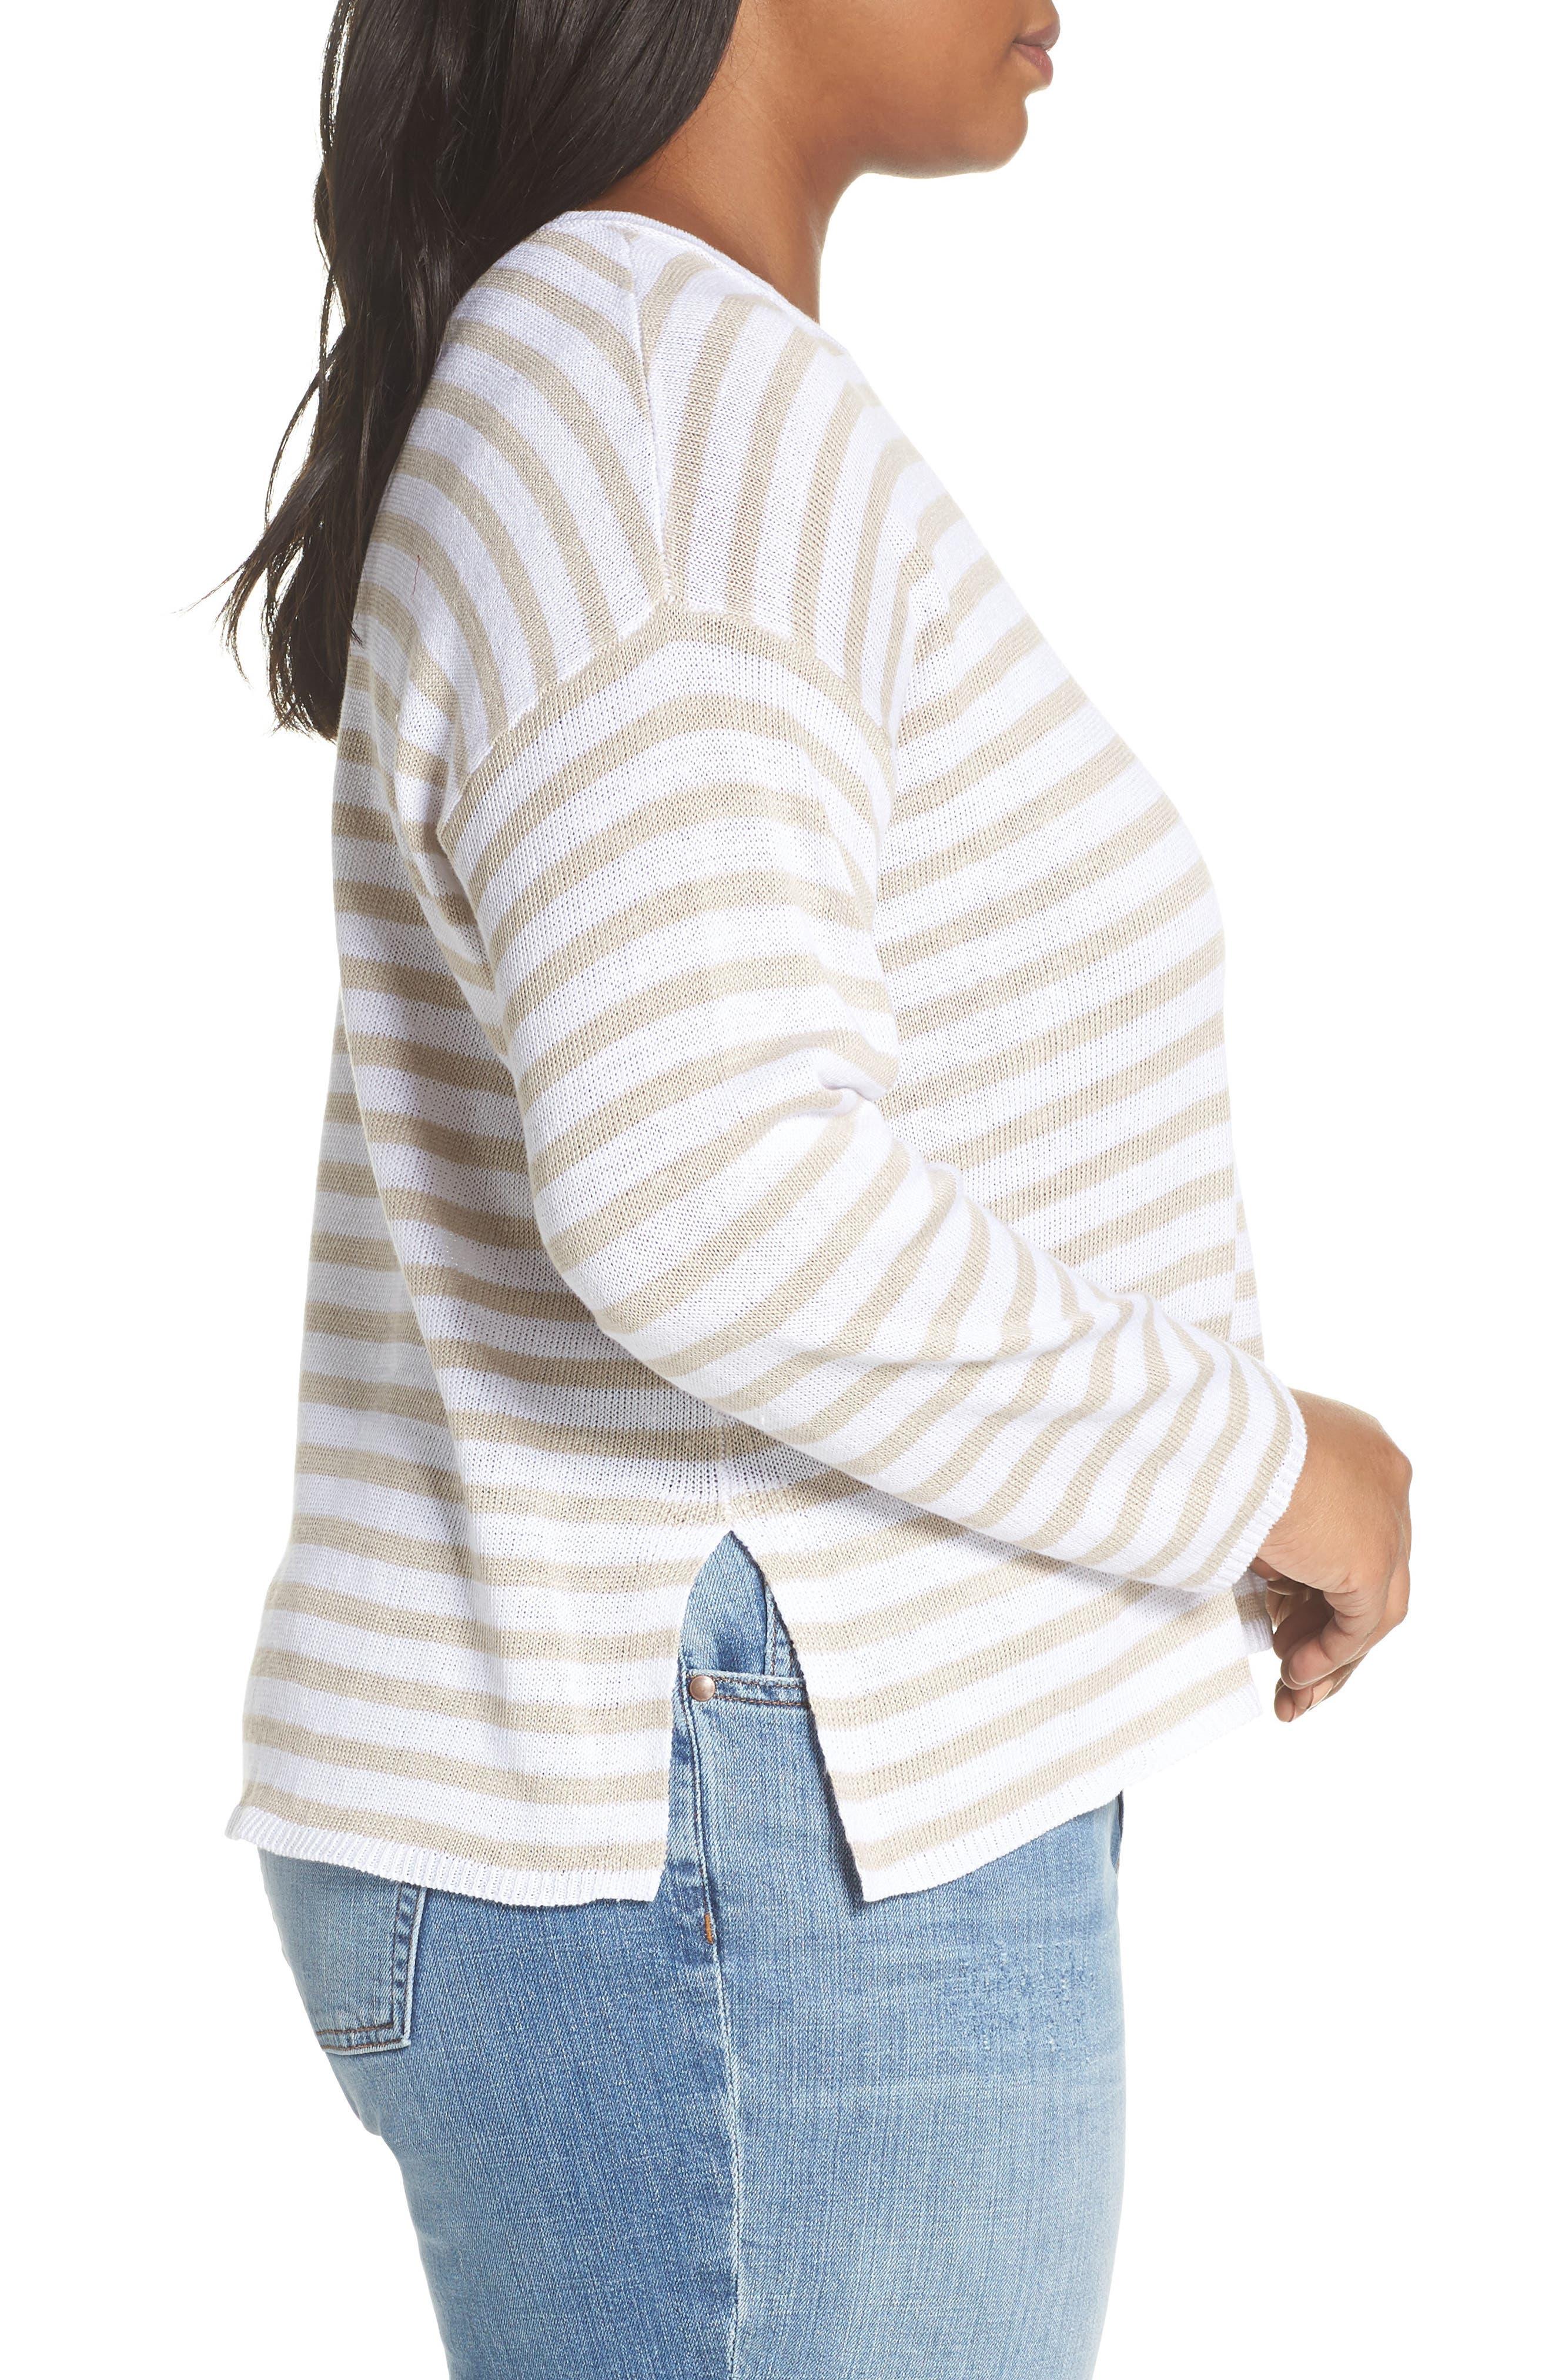 EILEEN FISHER, Stripe Organic Linen Sweater, Alternate thumbnail 3, color, WHITE NATURAL